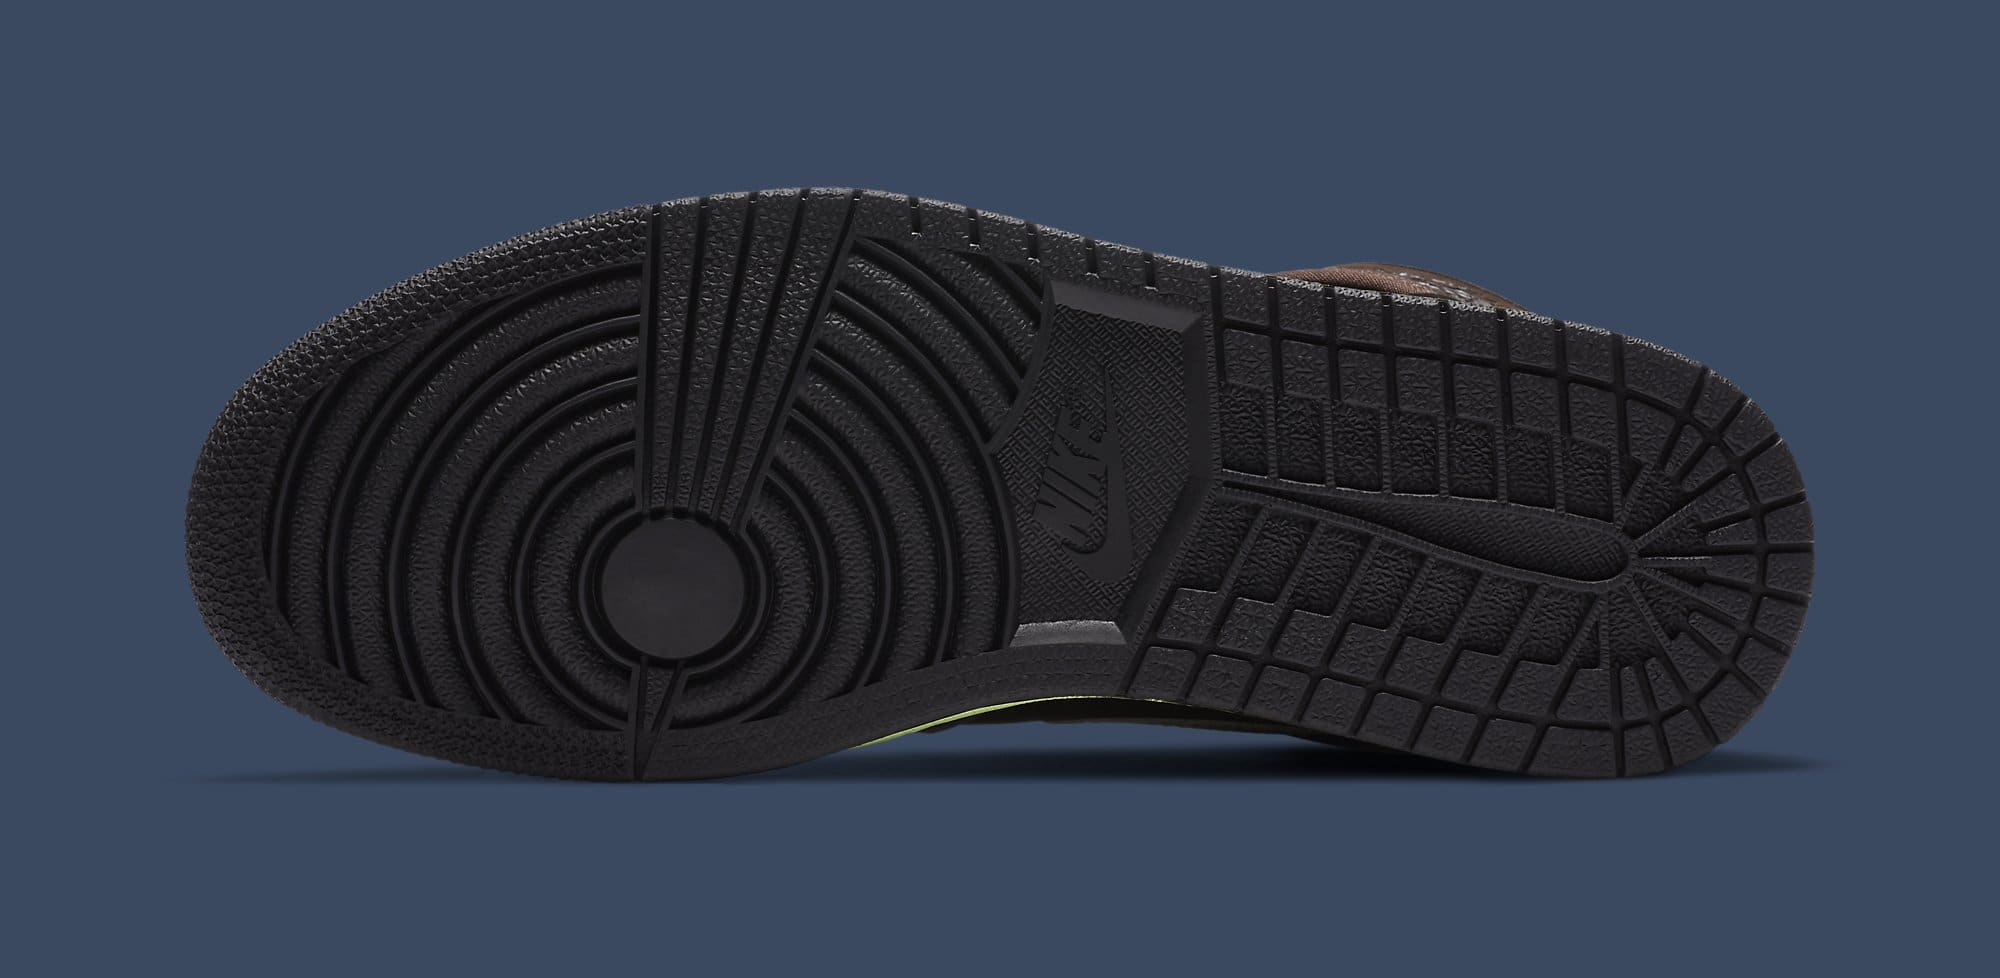 Air Jordan 1 Retro High OG 'Bio Hack' 555088-201 Outsole